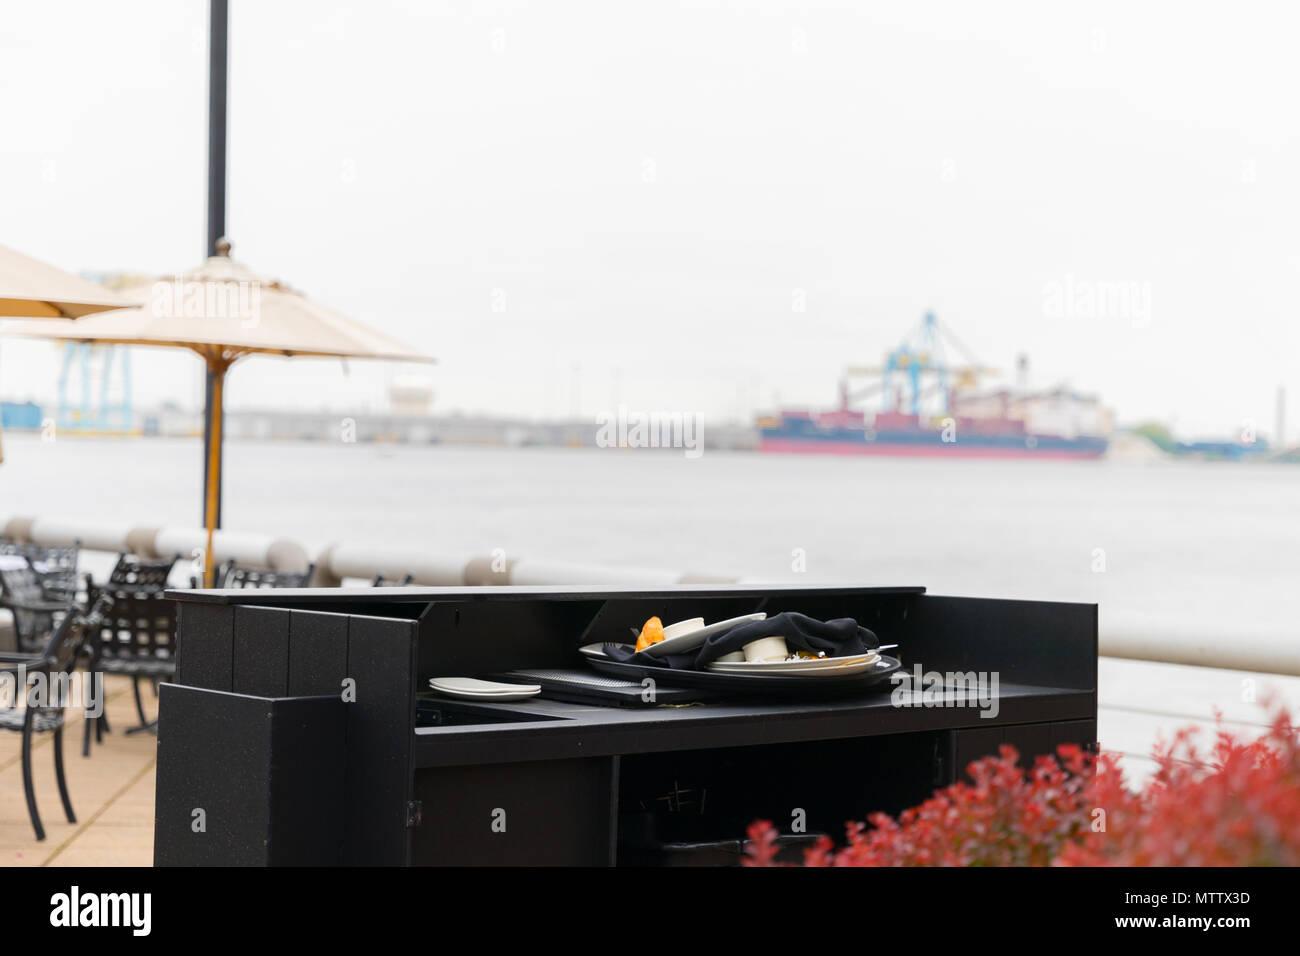 New Seafood Restaurant In Alexandria La